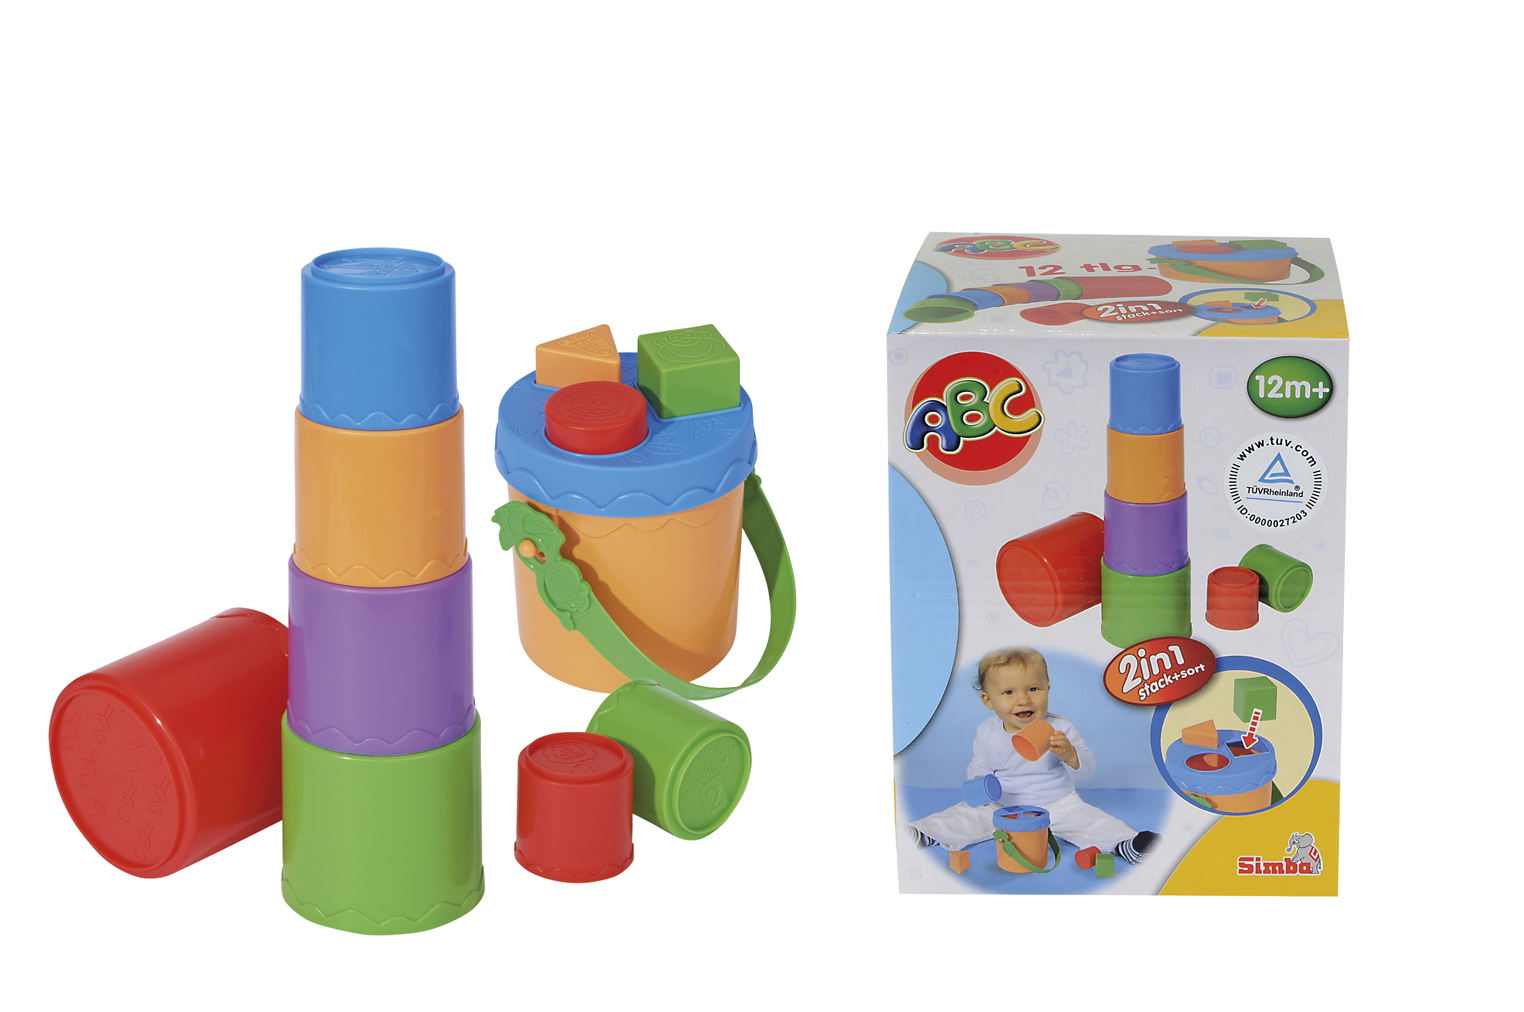 Развиваща игрушка Пирамидка-сортерСортеры, пирамидки<br>Развиваща игрушка Пирамидка-сортер<br>